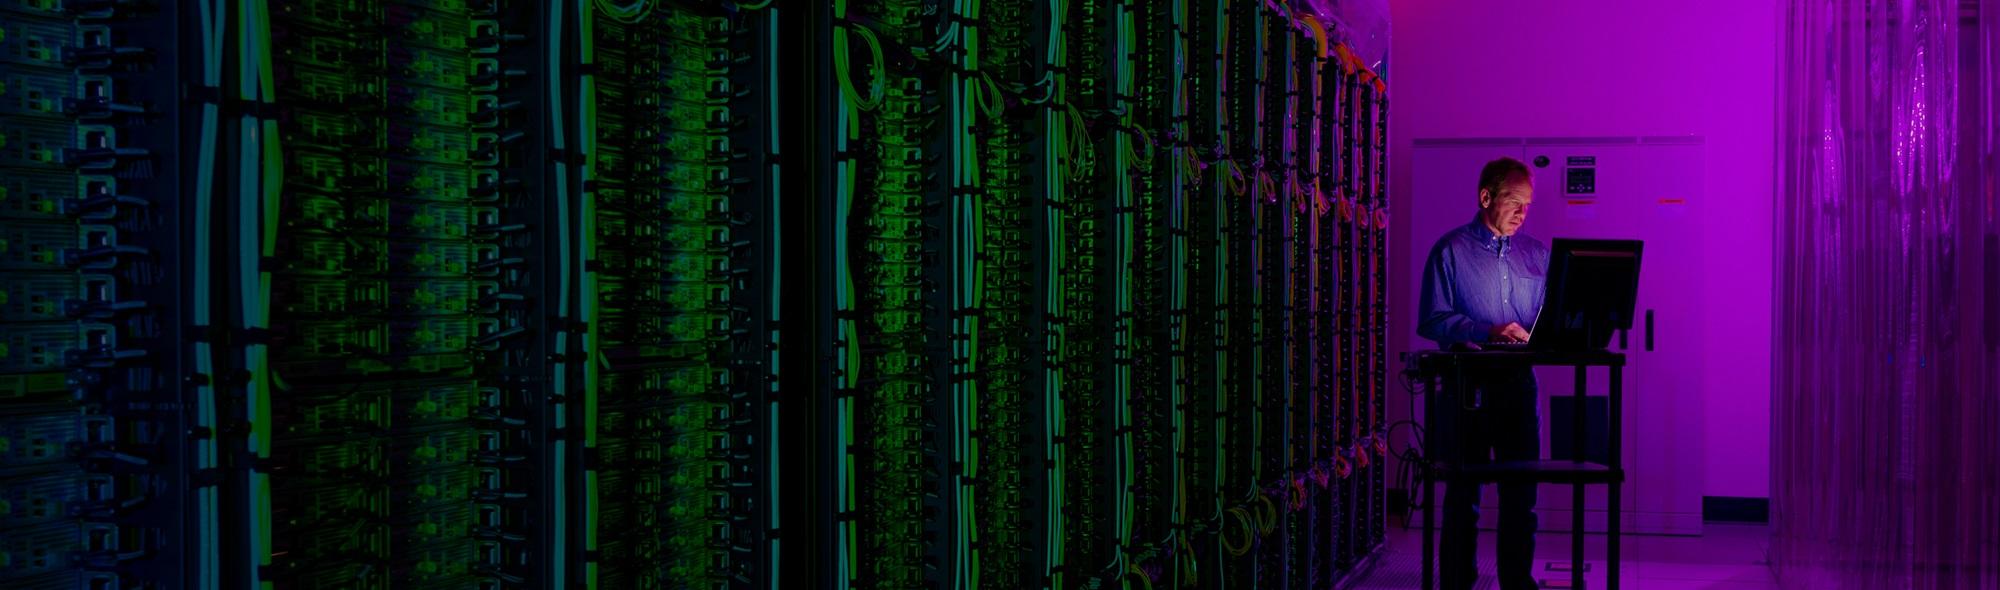 Global Datacenters image